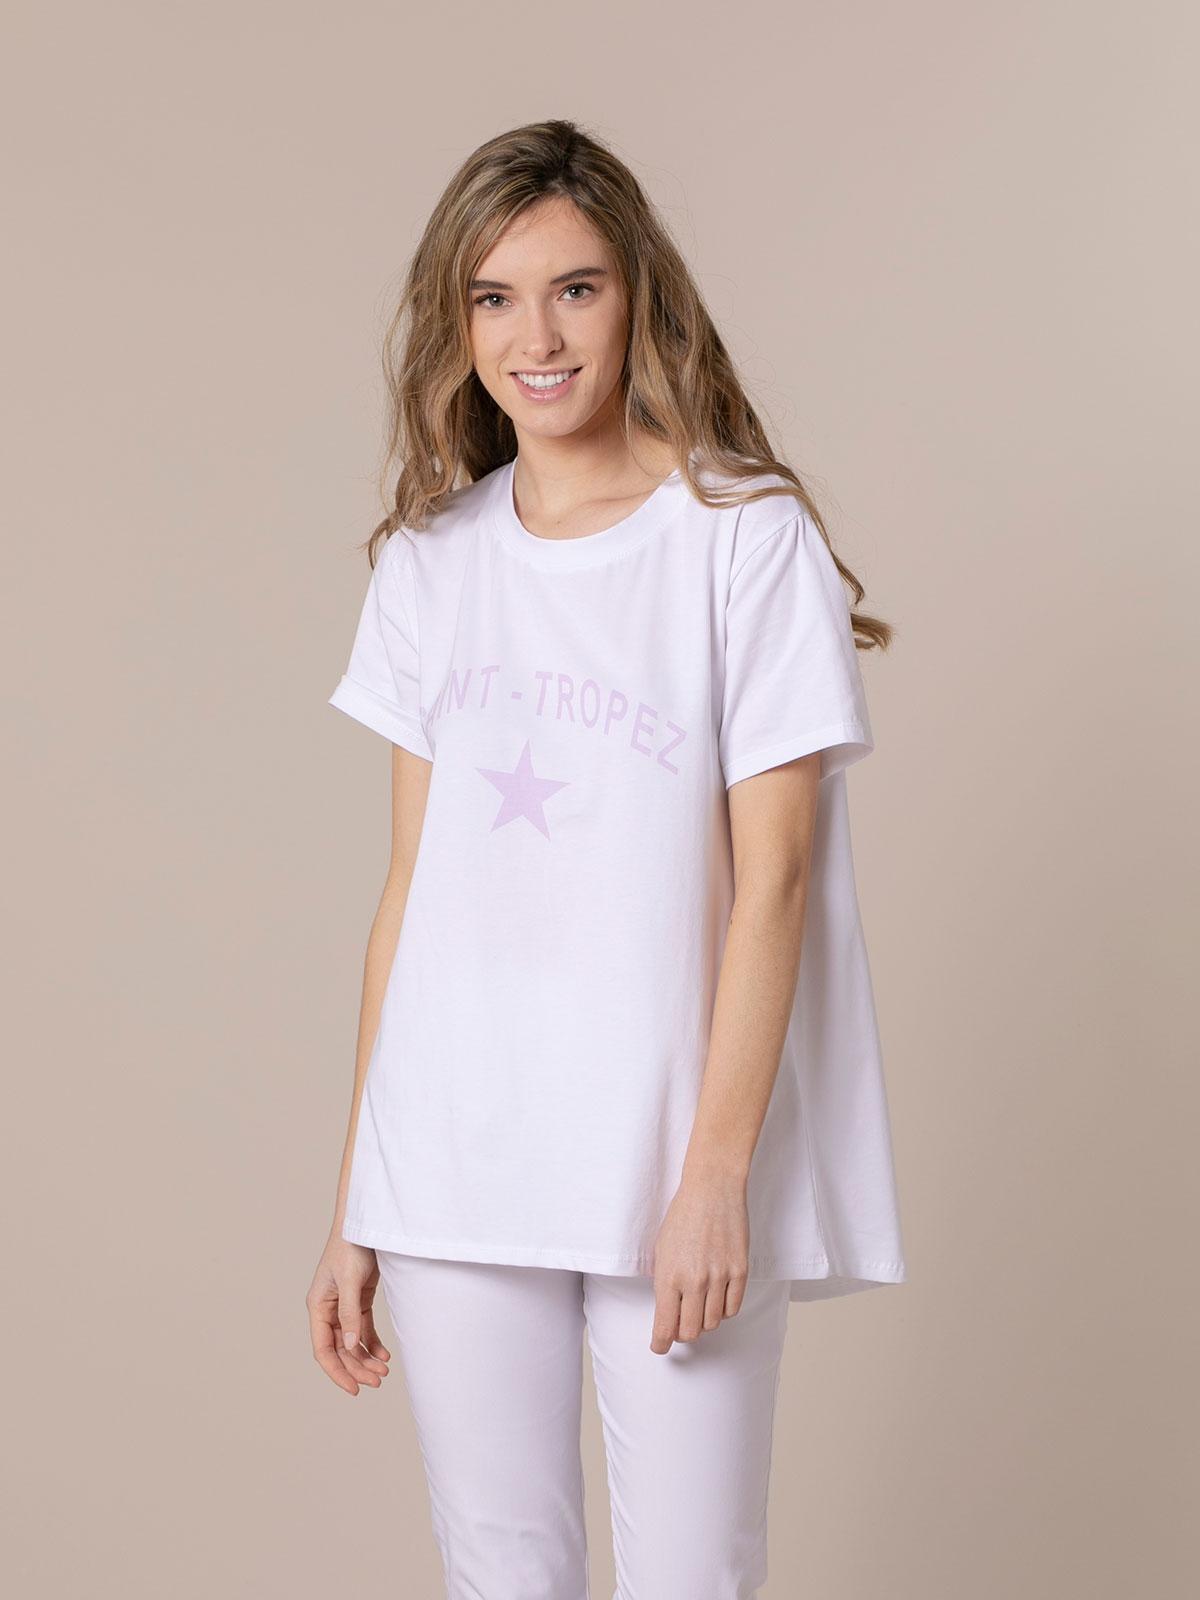 Camiseta mujer orgánica mensaje St tropez Lila